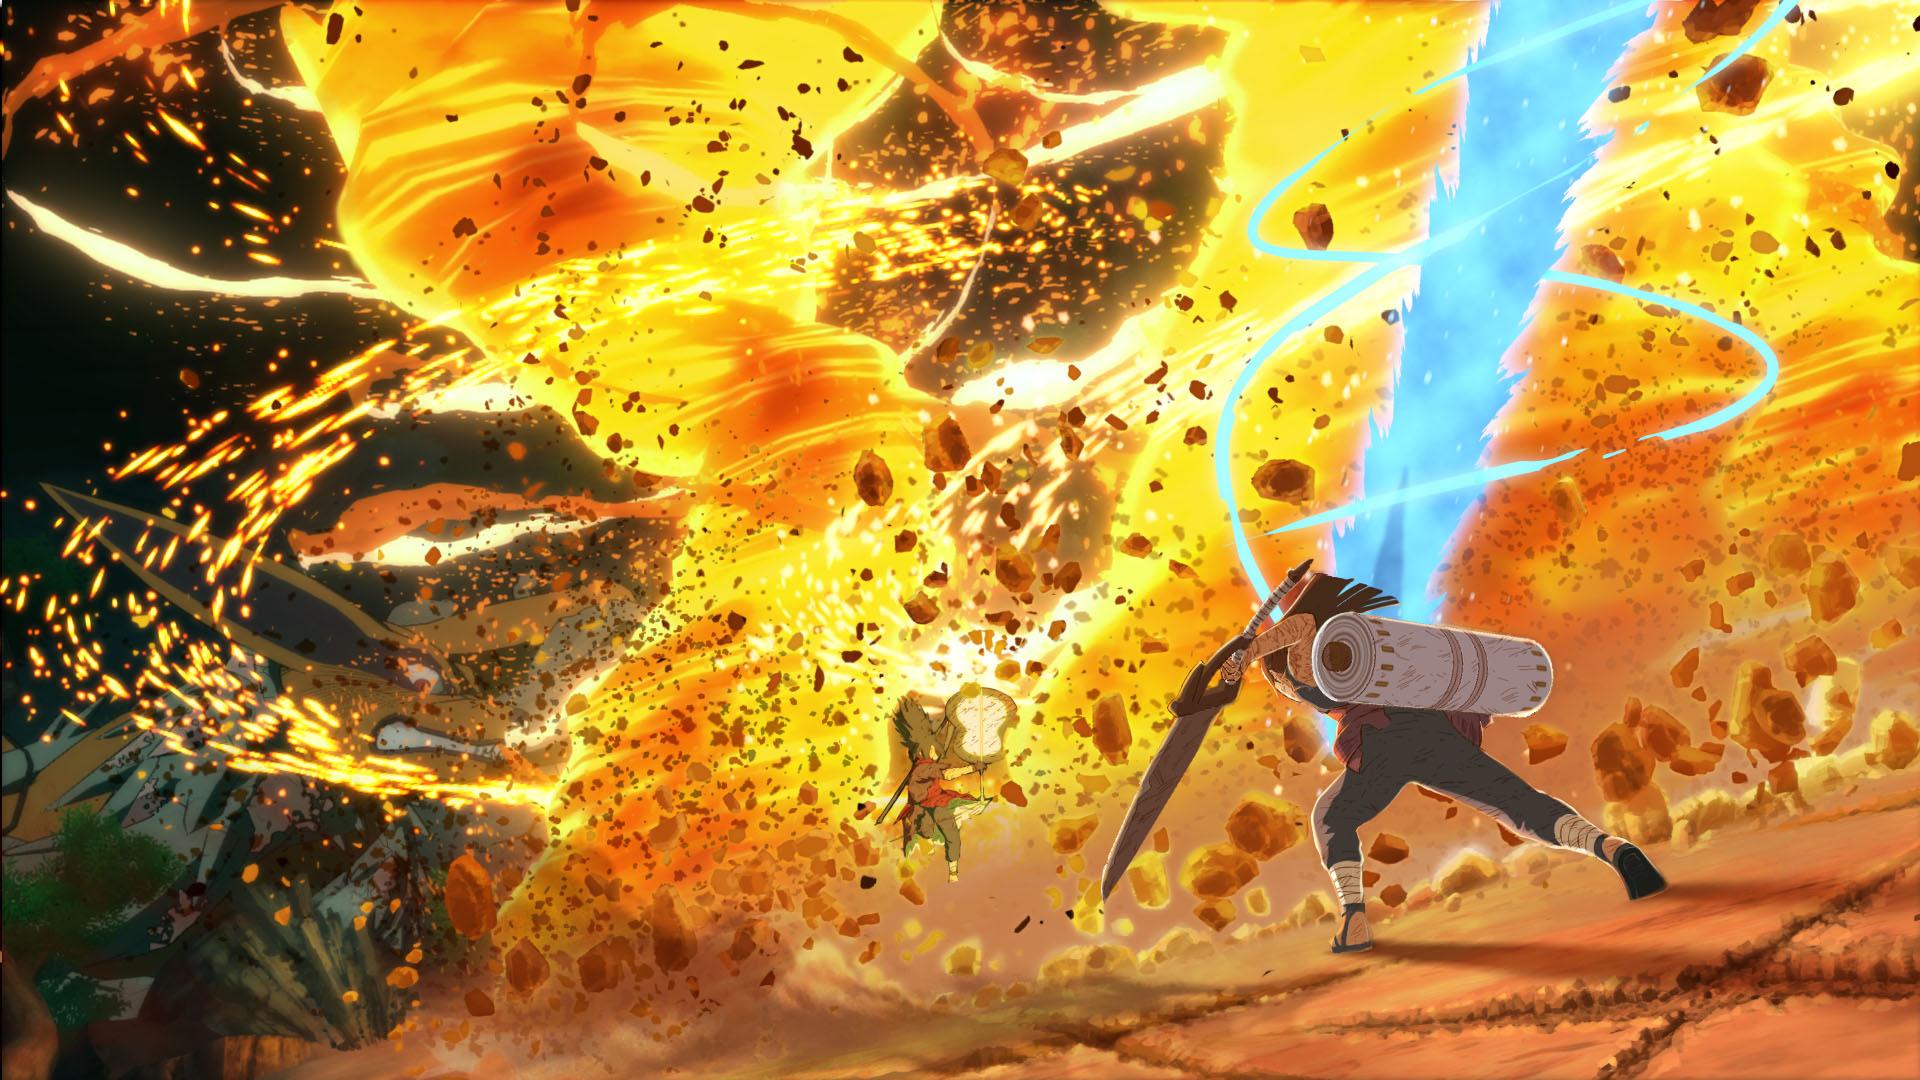 NARUTO SHIPPUDEN: Ultimate Ninja STORM 4 - Imagem 1 do software